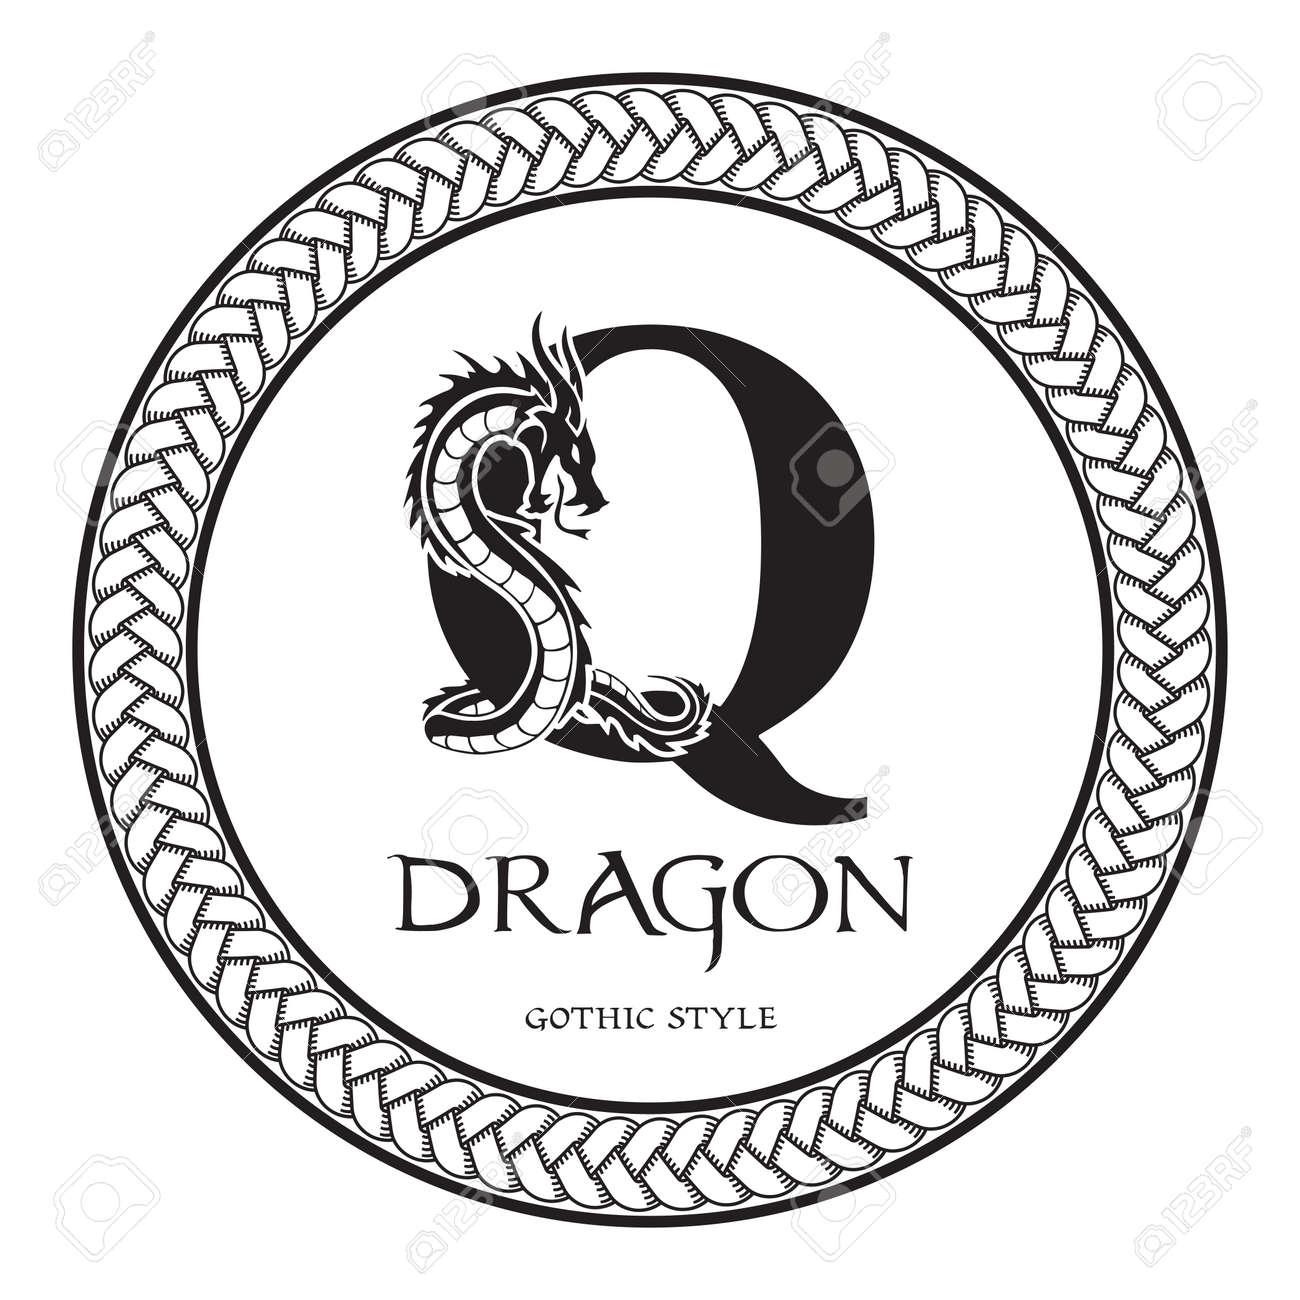 Dragon Silhouette Inside Capital Letter Q. Elegant Gothic Dragon ...